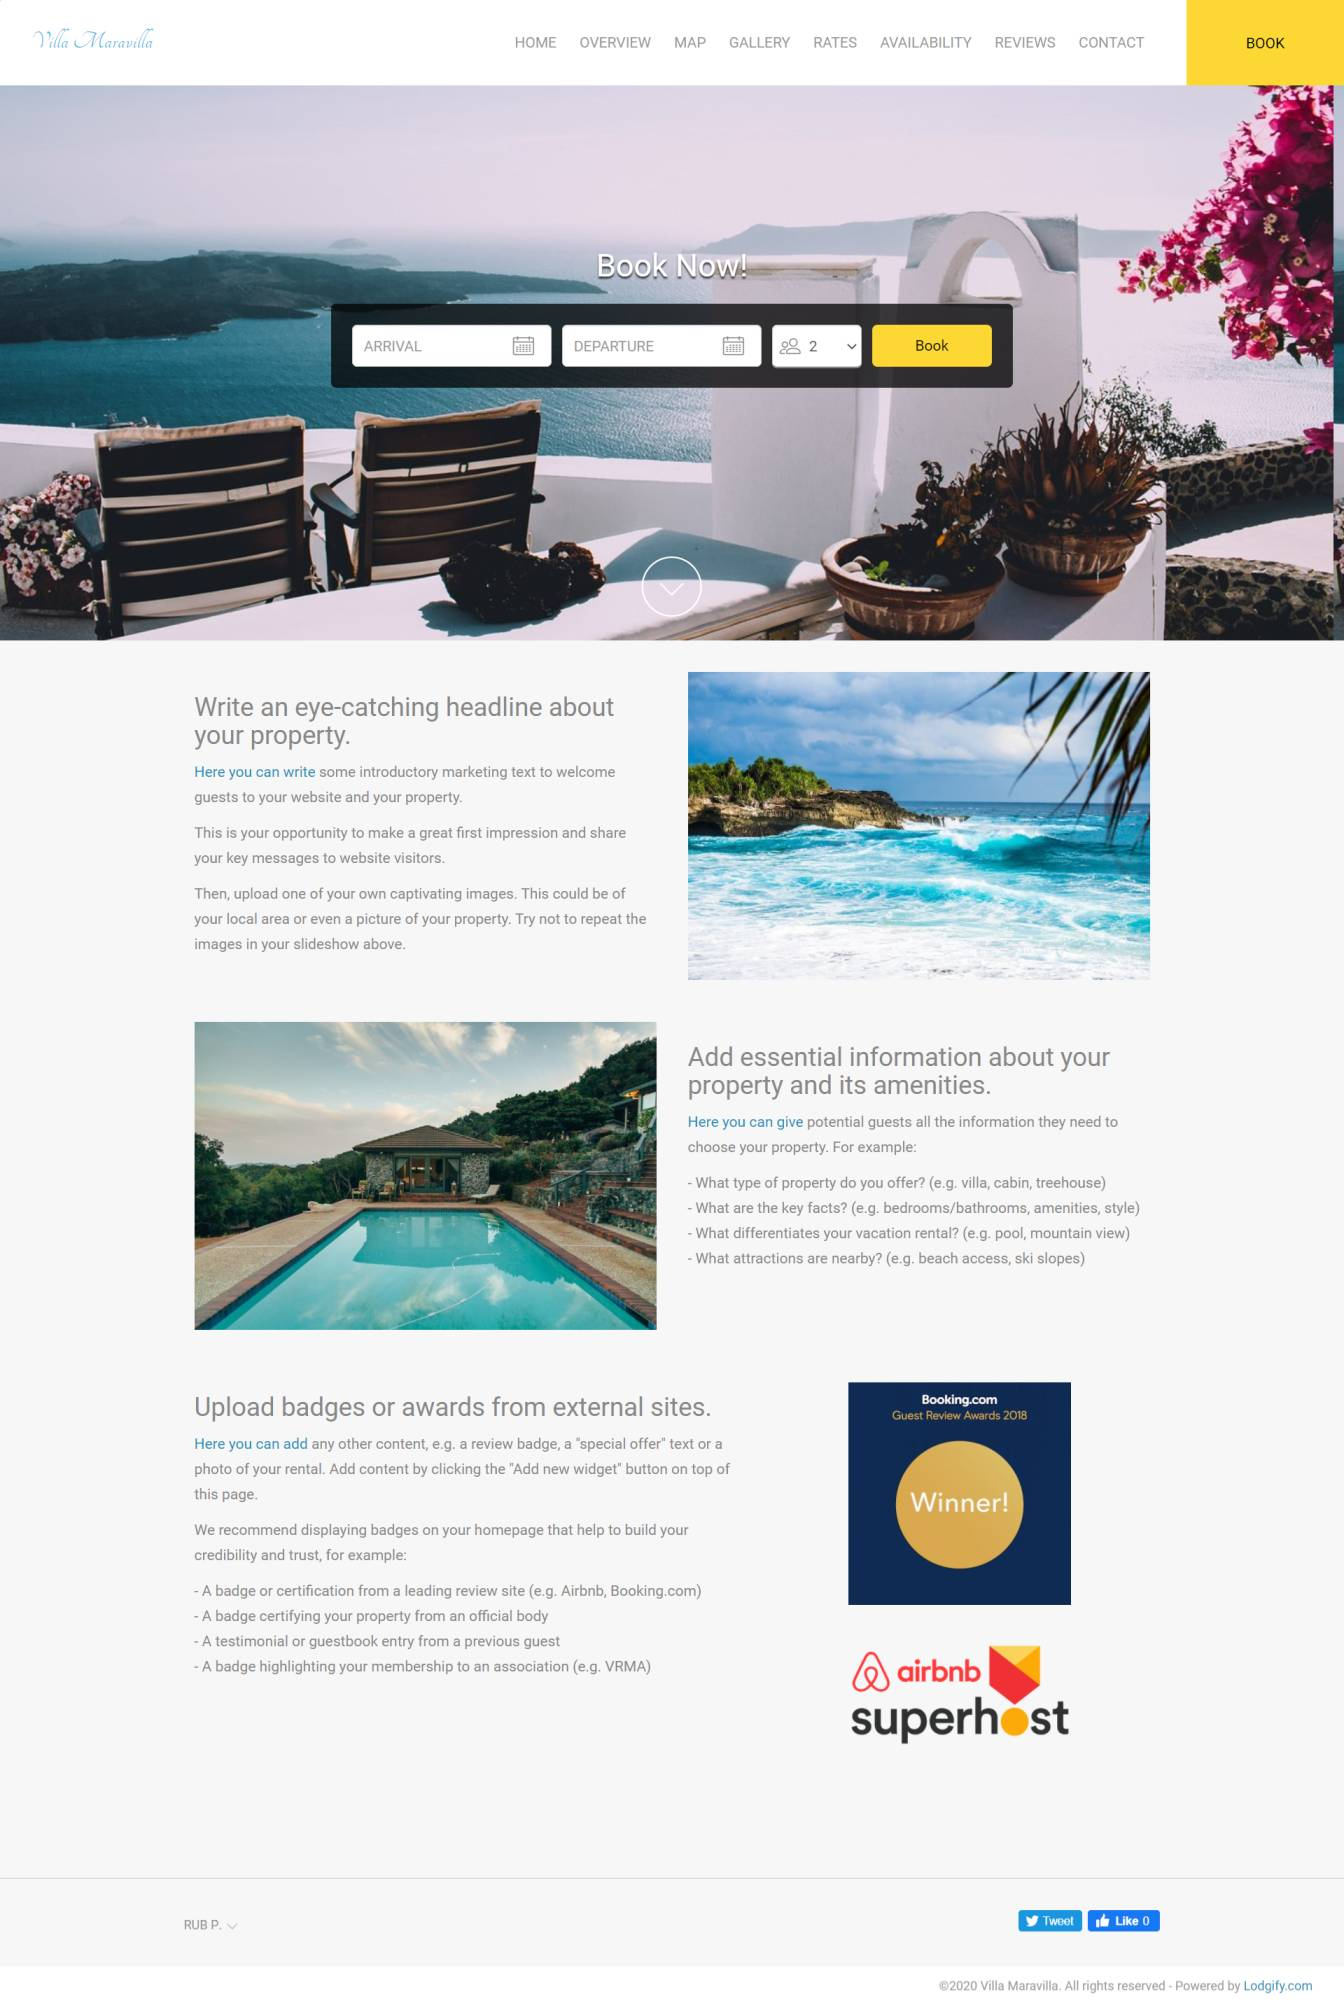 Lodgify screenshot: Vacation rental website template